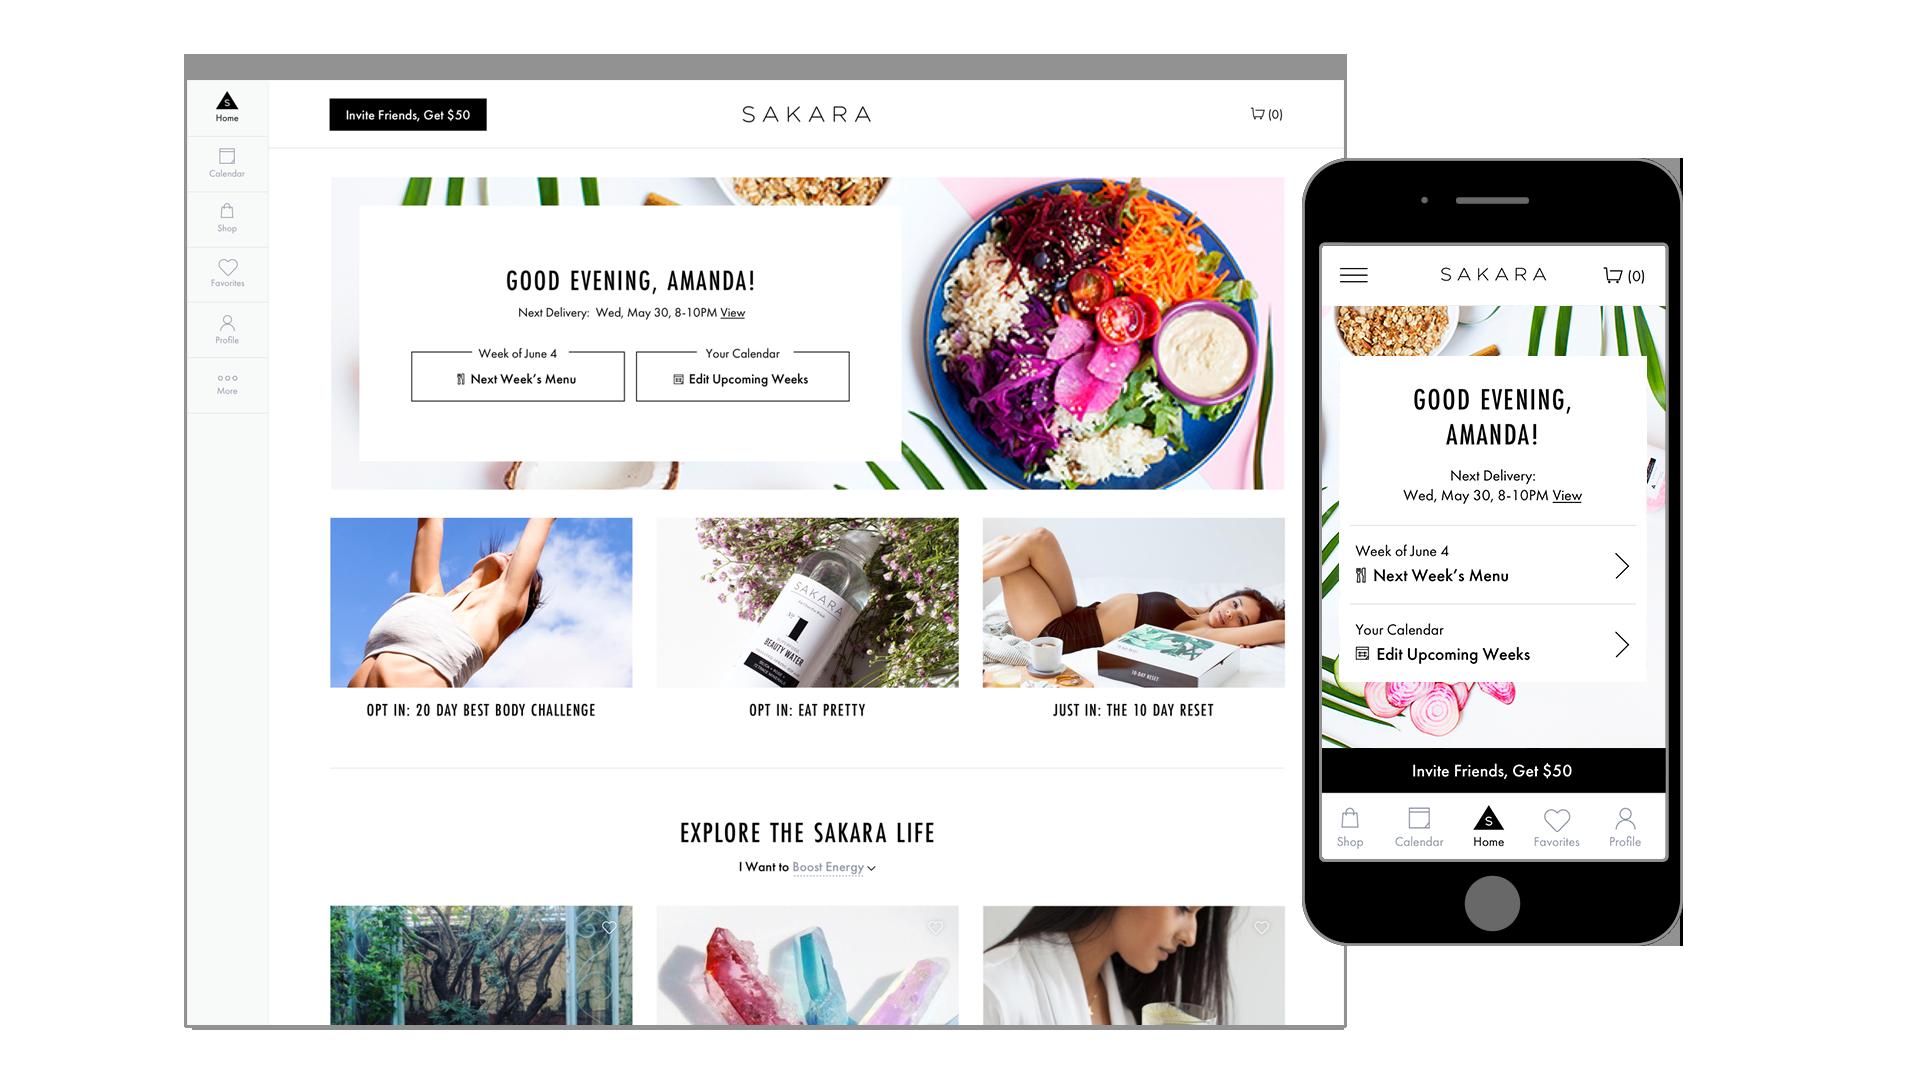 Sakara Life Customer Dashboard Mockup Desktop and Mobile